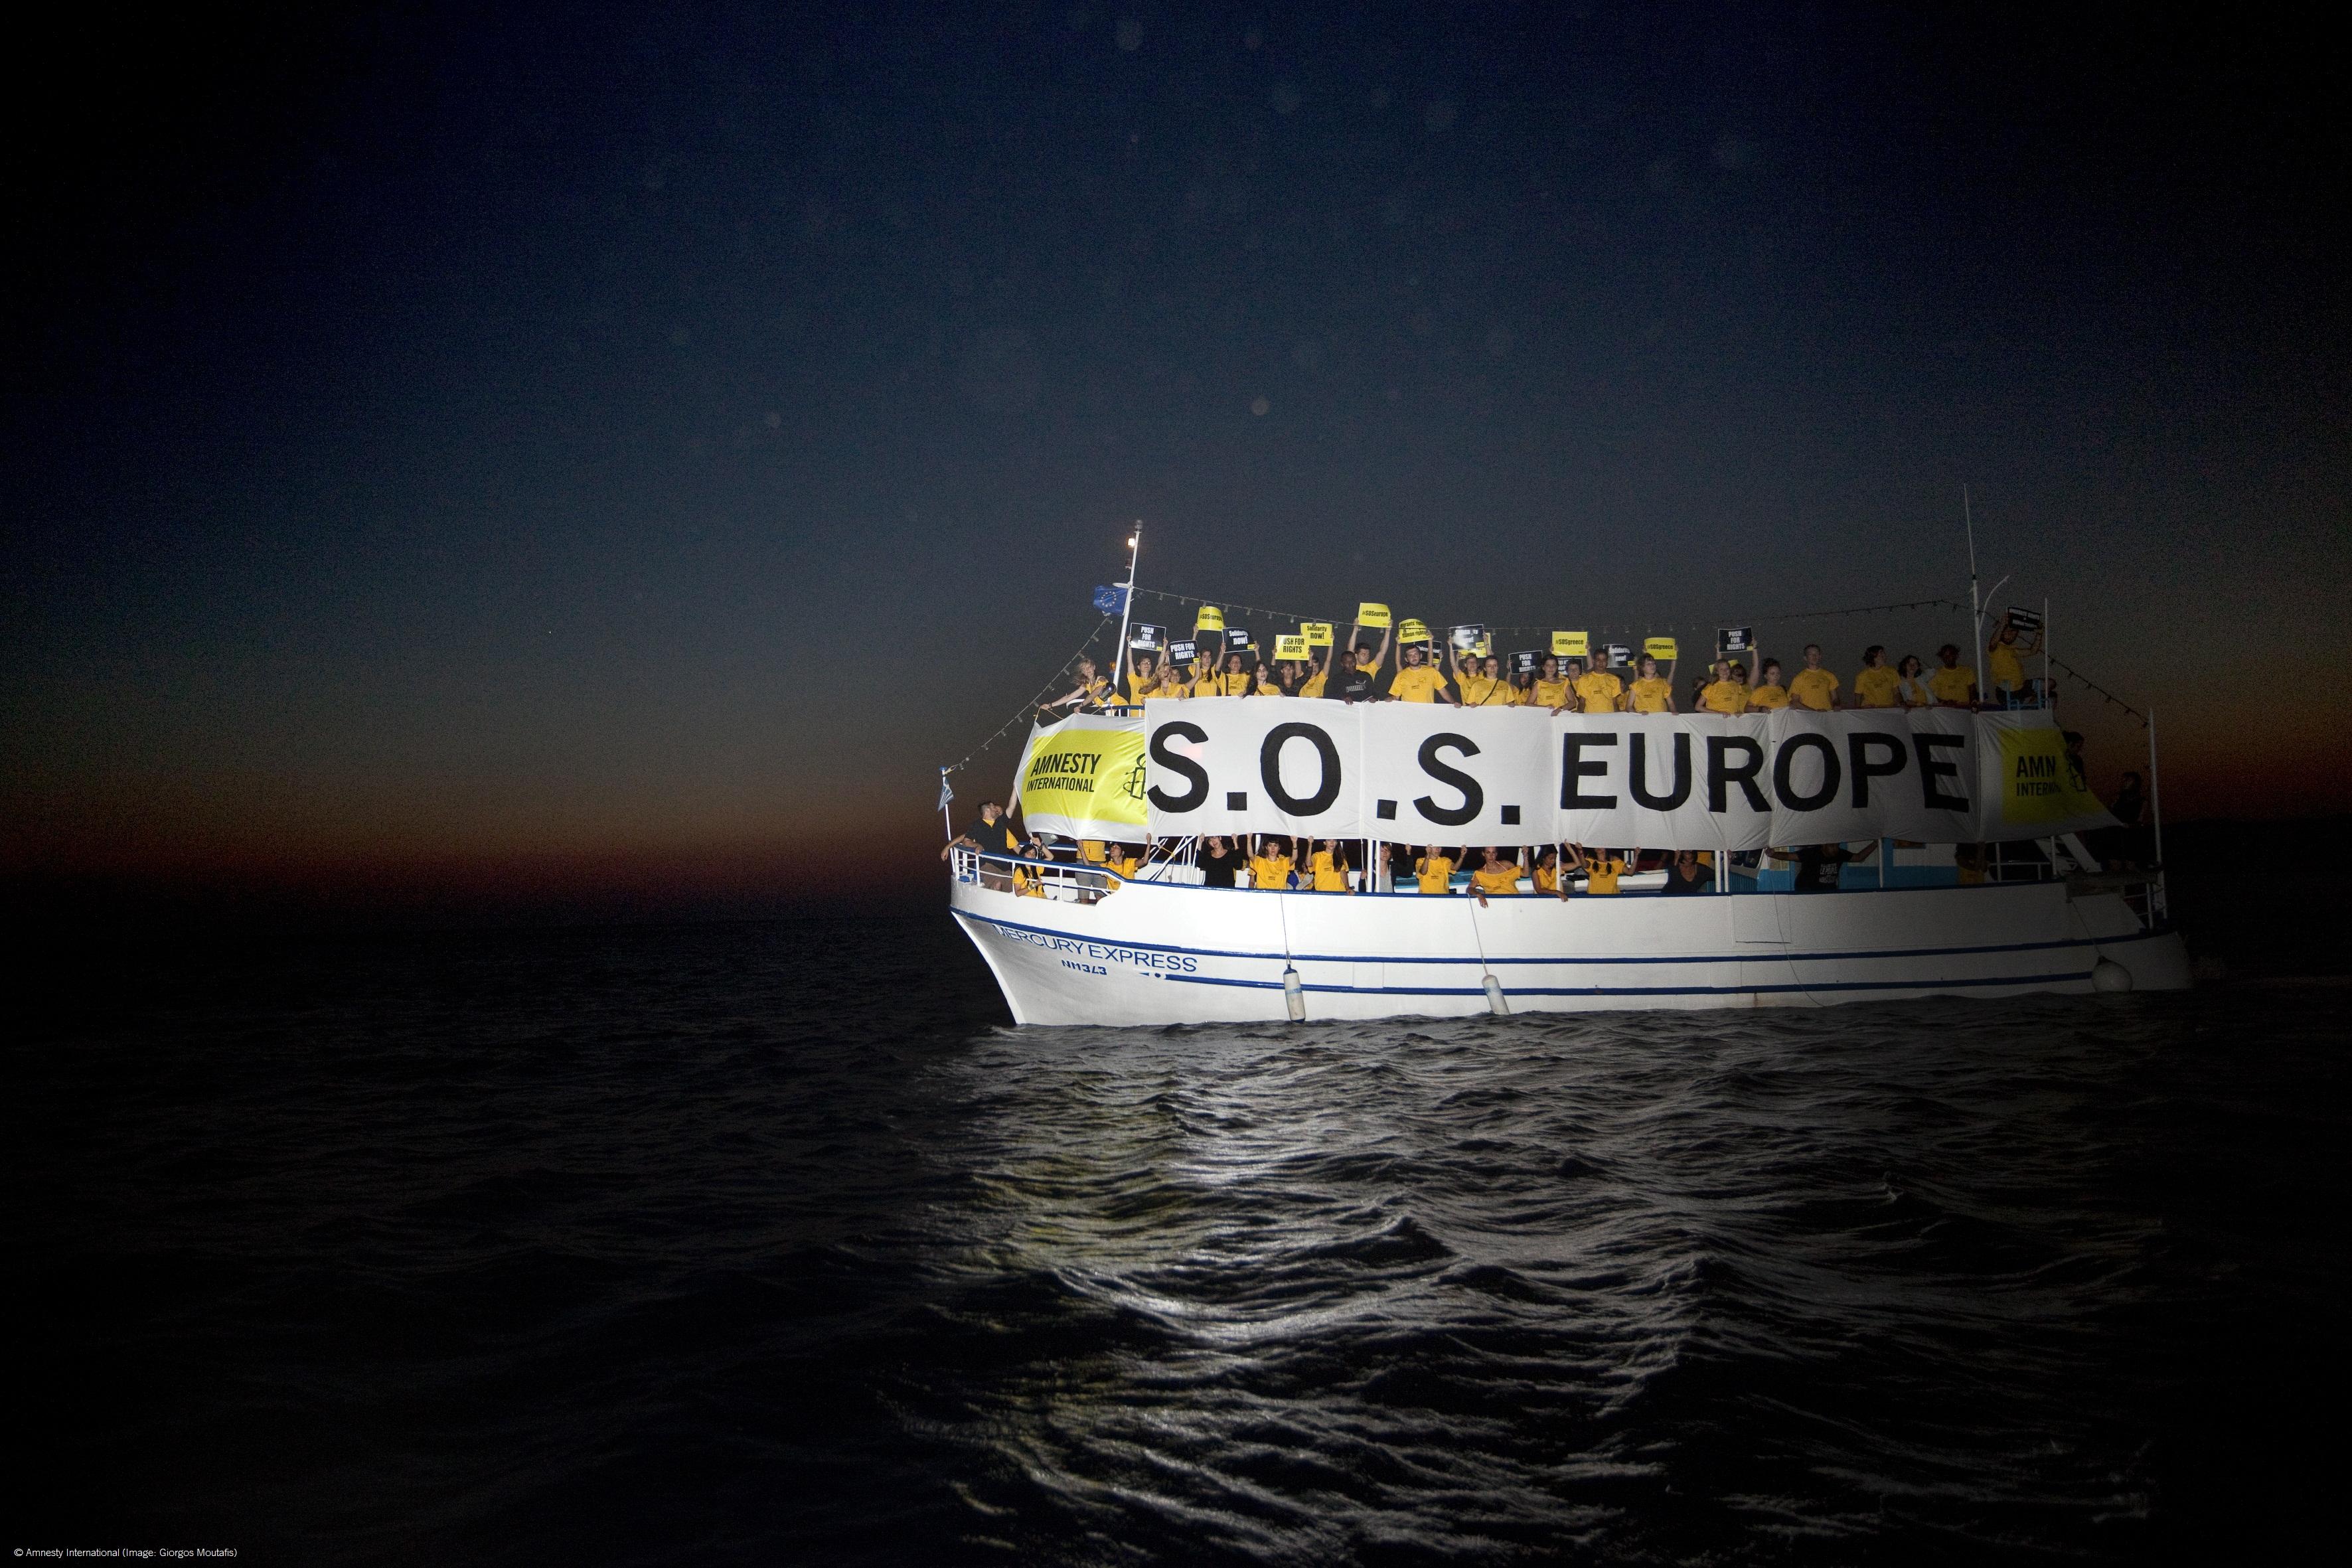 sos-europe-pic